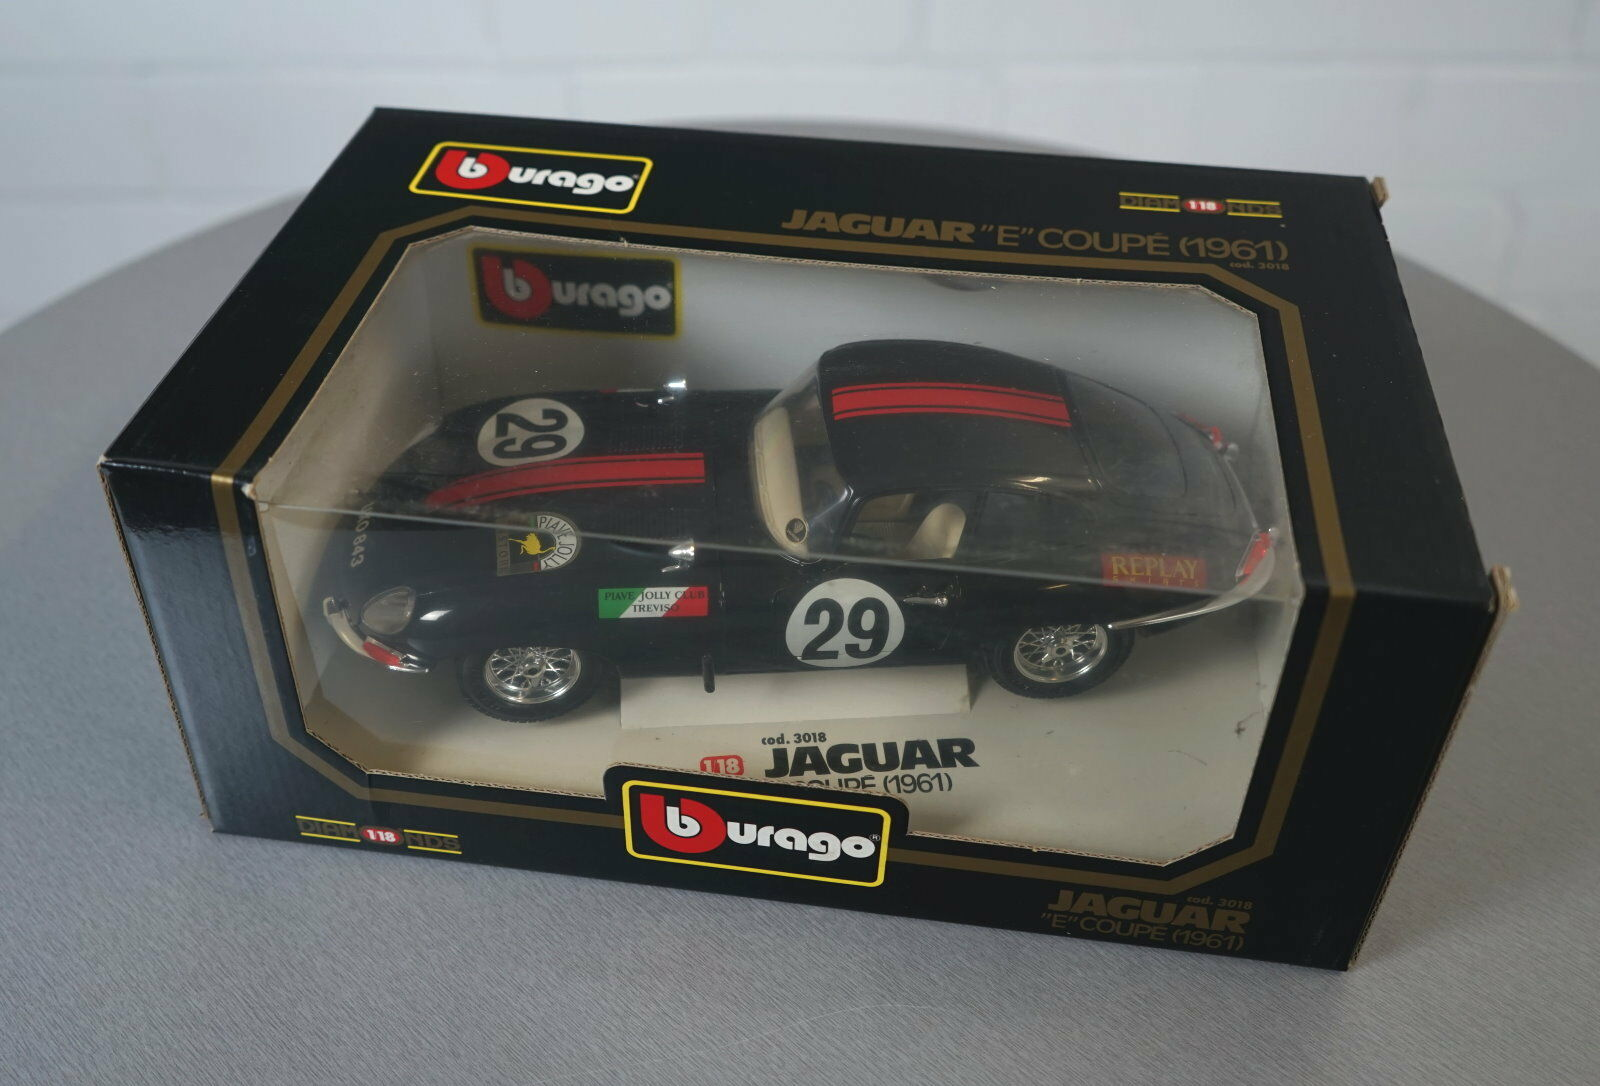 Burago 1   18 jaguar e - coupé (1961) schwarz - 3018 - druckguss - modell neu ovp